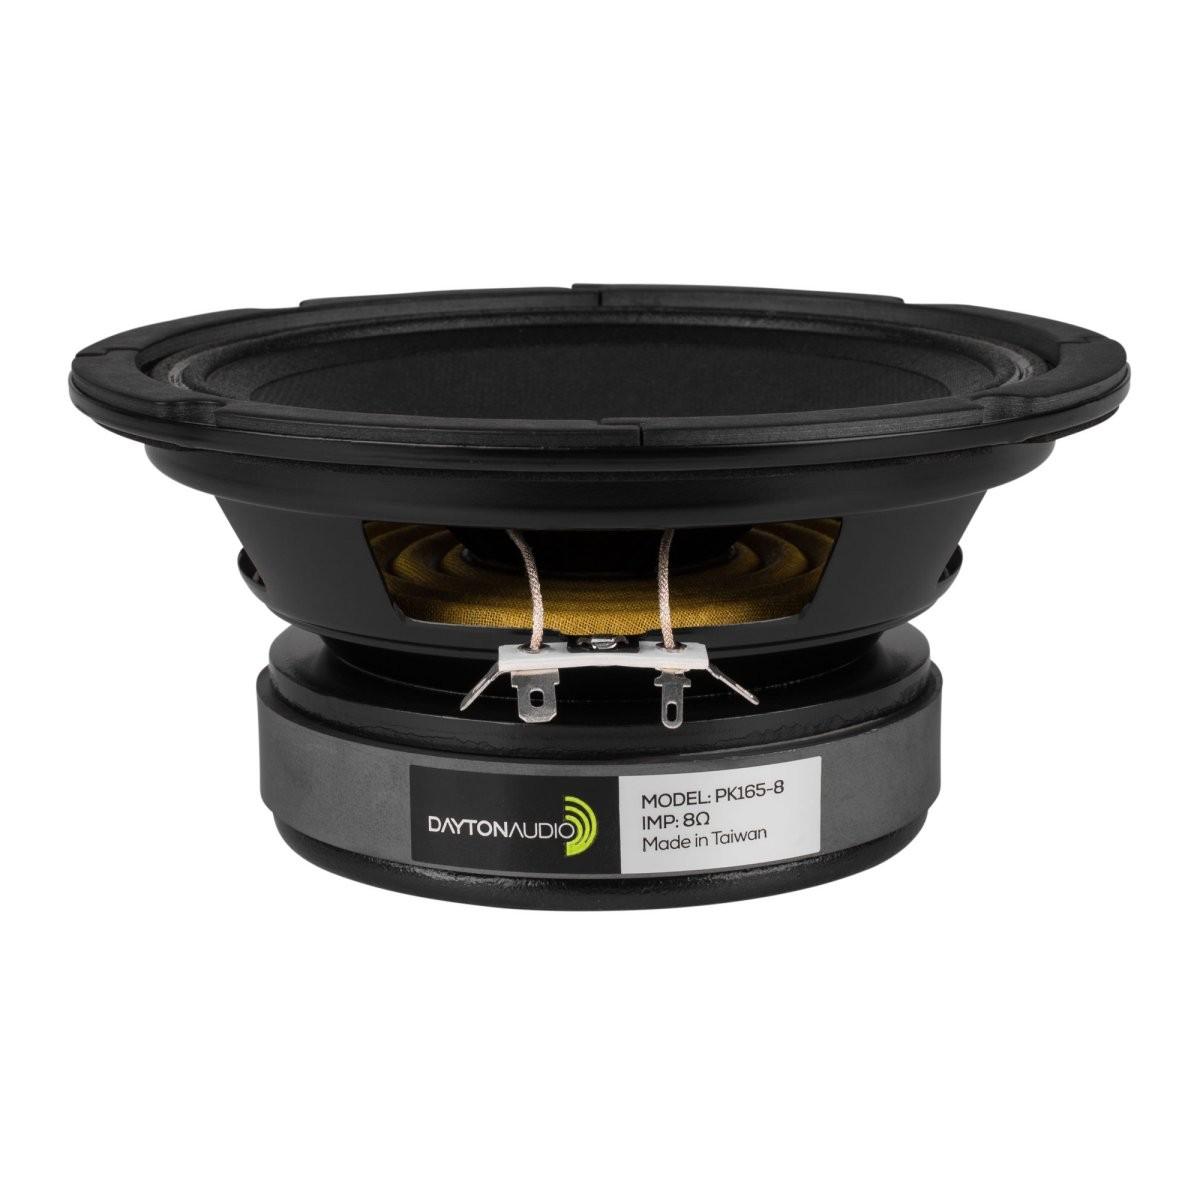 DAYTON AUDIO PK165-8 Speaker Driver Midrange Kevlar / Paper 100W 8 Ohm 91dB 95Hz - 9000Hz Ø16.5cm